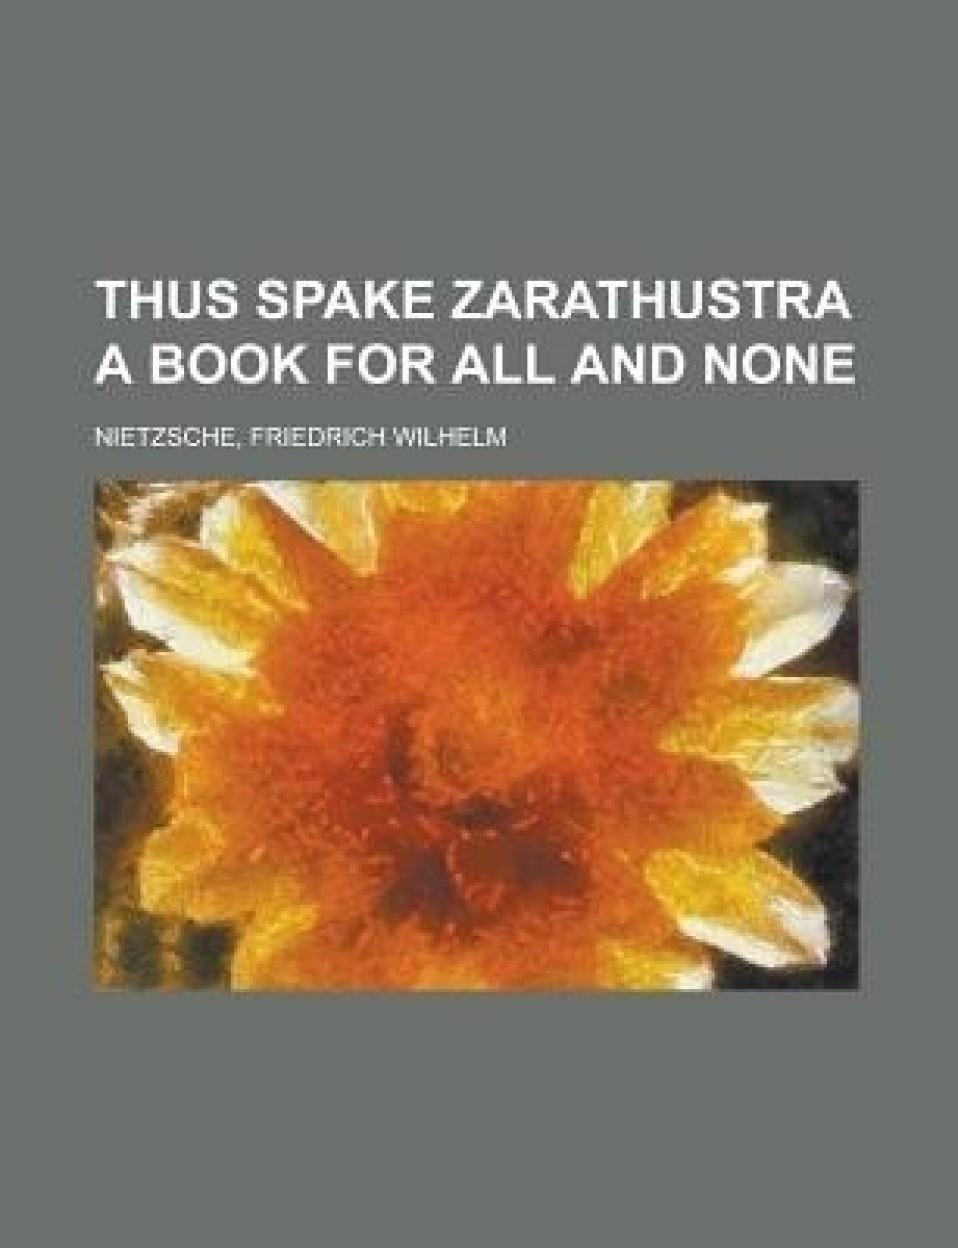 Thus Spake Zarathustra (PAPERBACK)